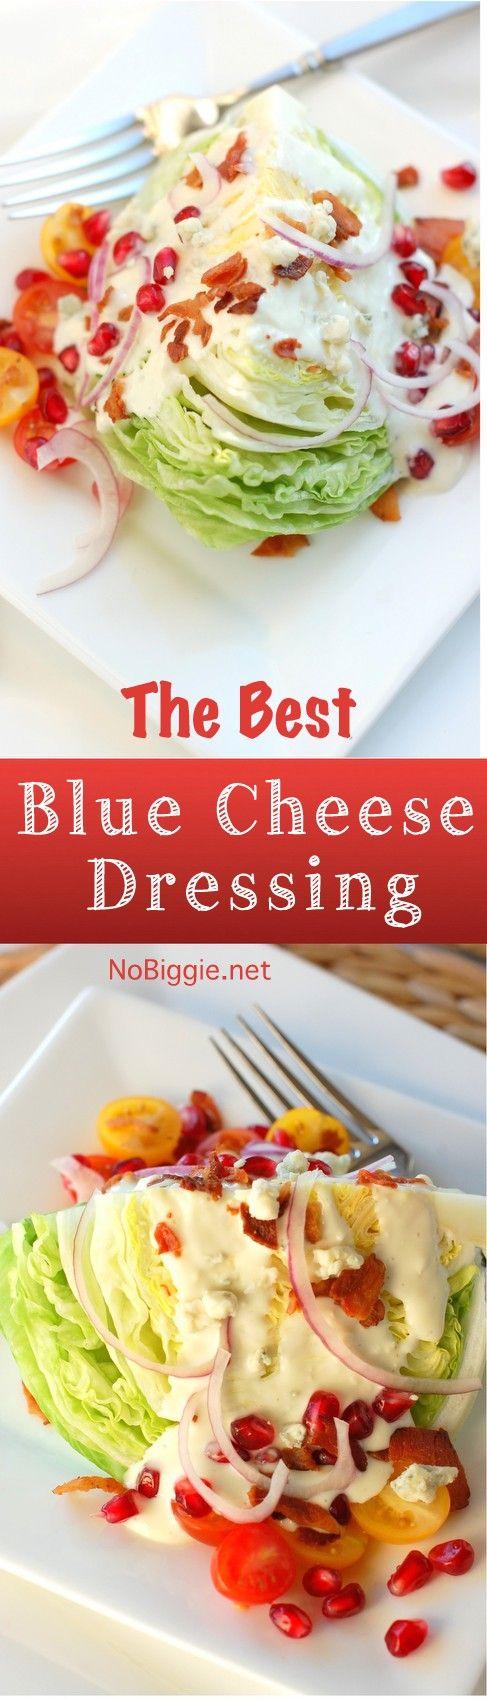 Recipe for the BEST blue cheese dressing   NoBiggie.net